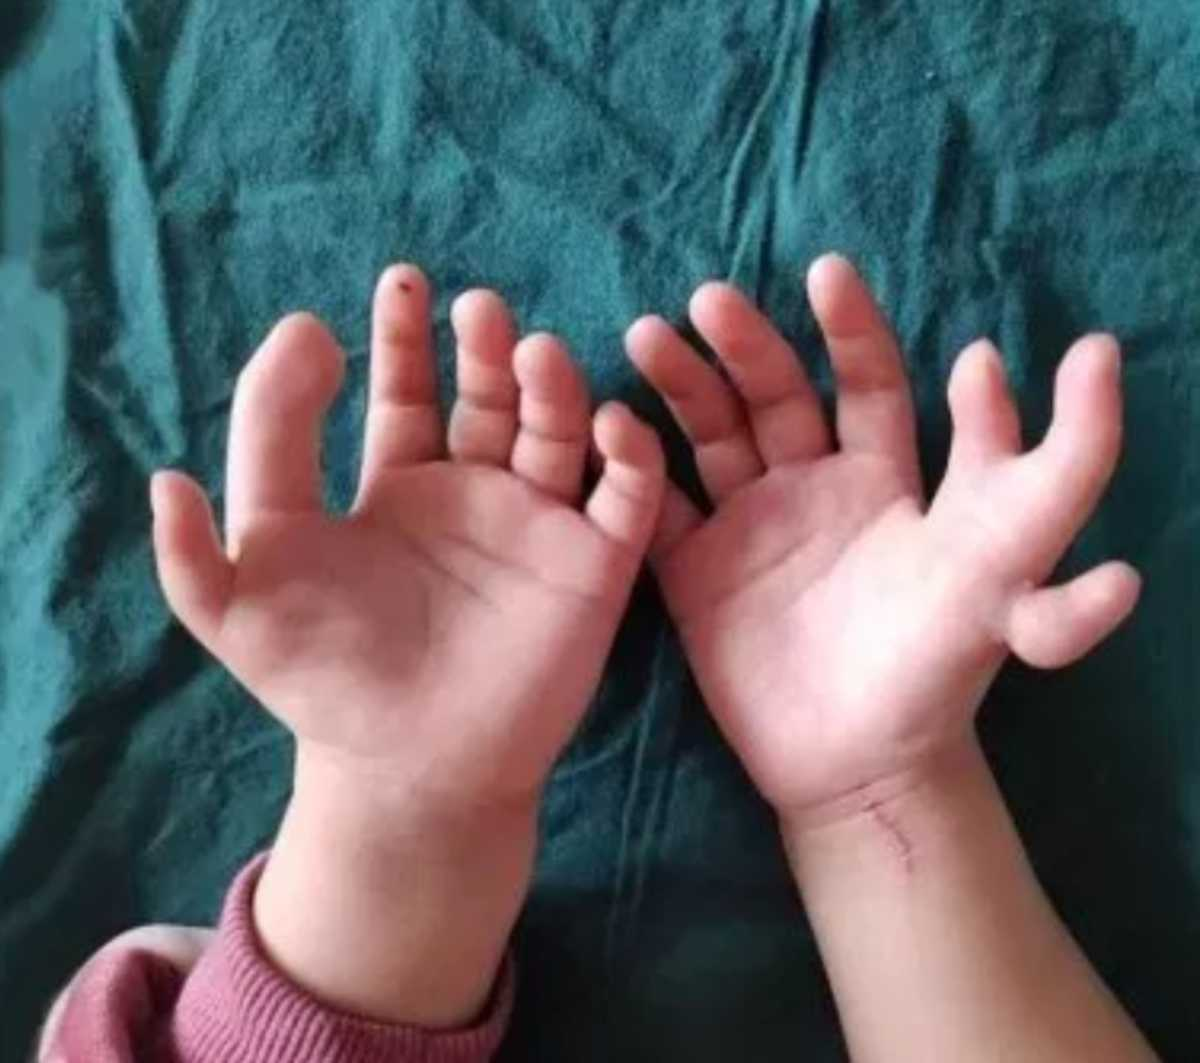 Difetto genetico ereditario, bimba nasce con 12 dita